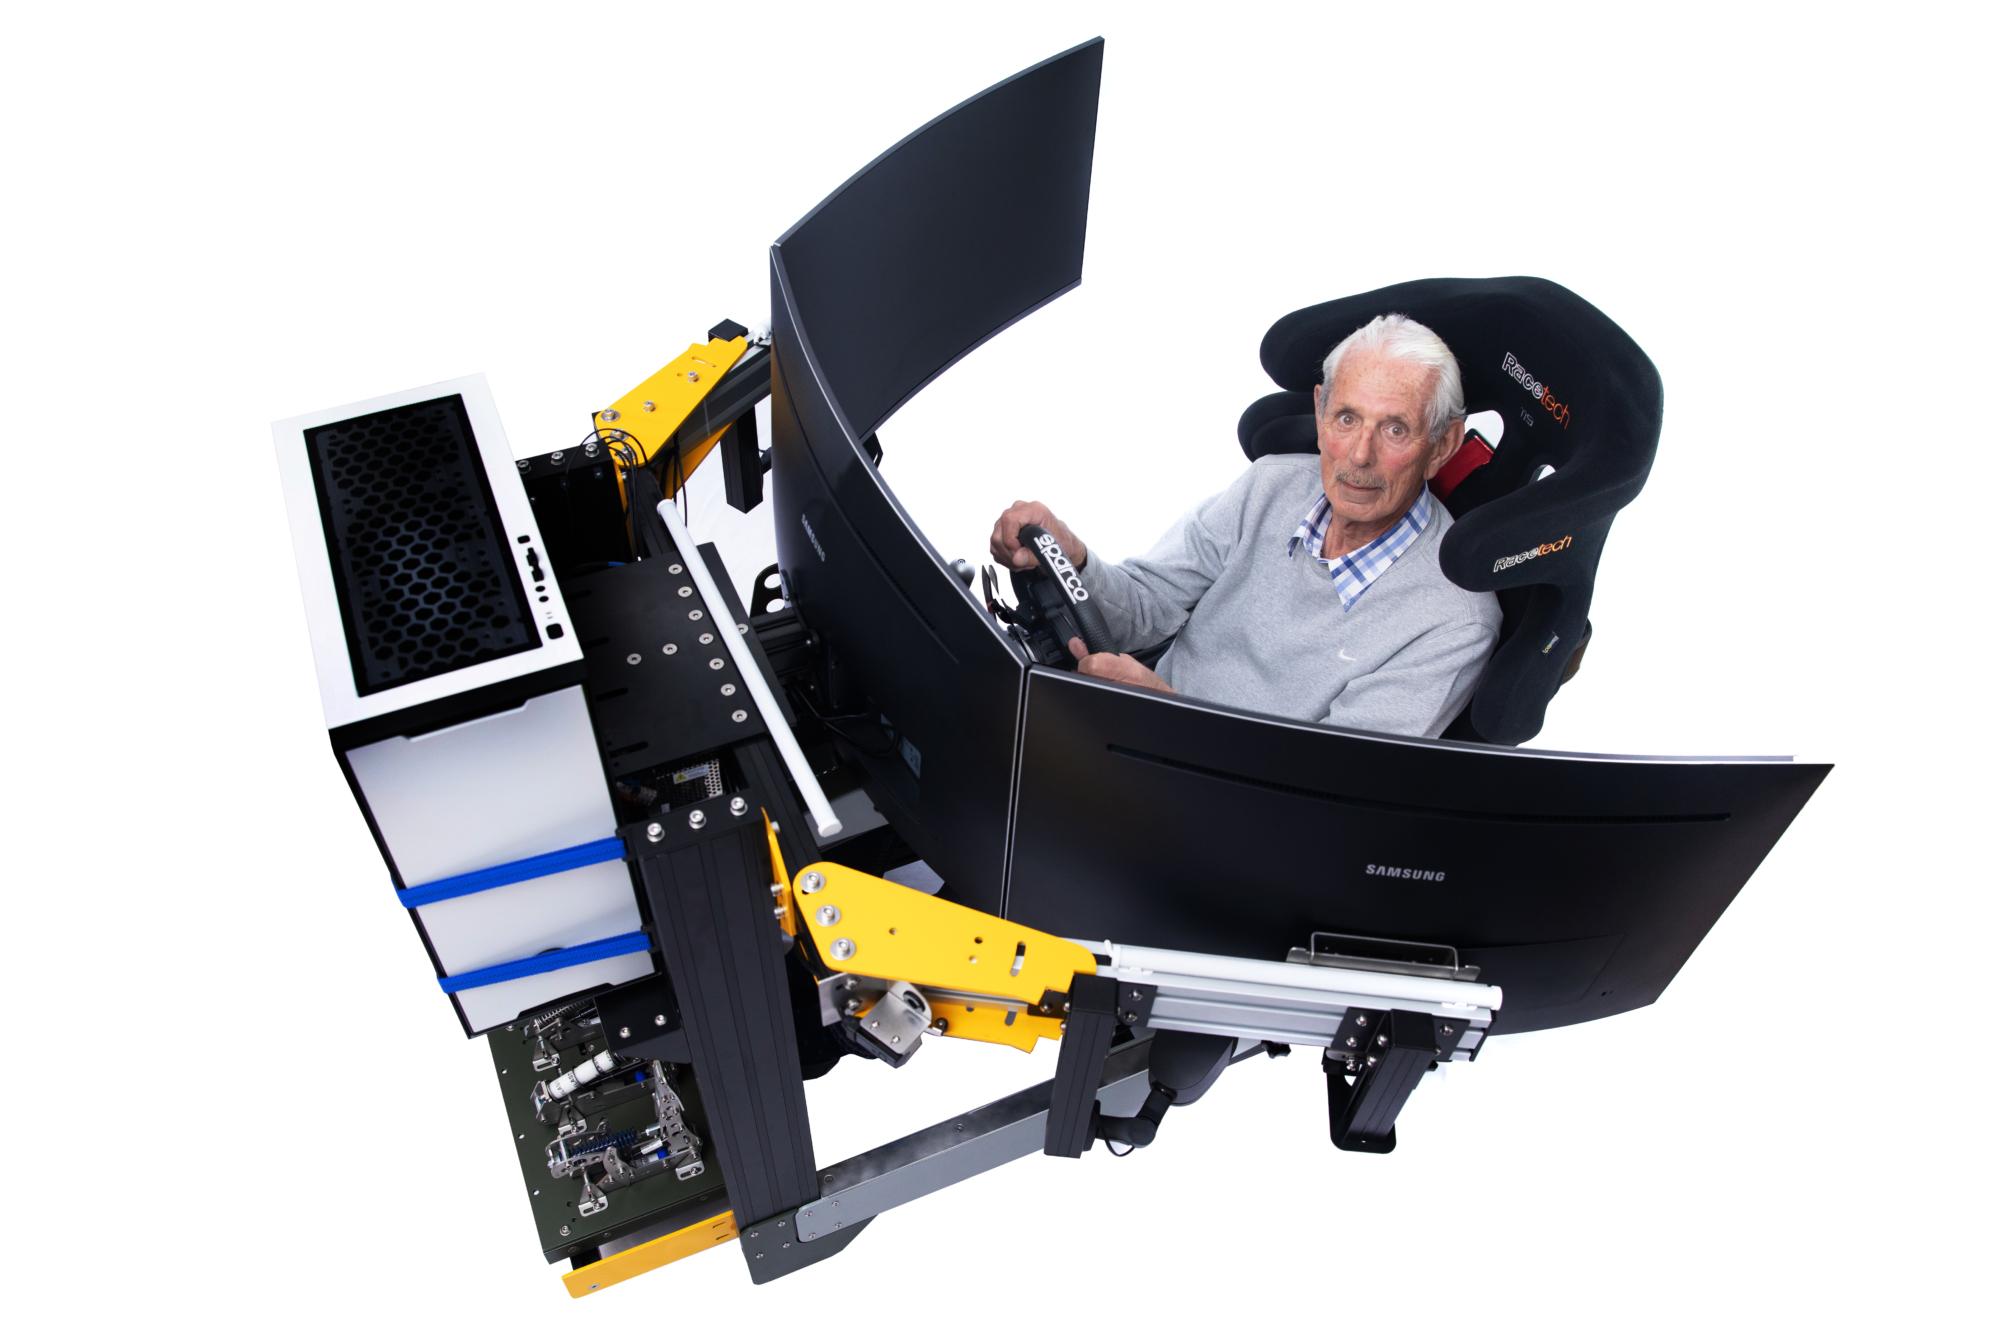 Sarel van der Merwe My Sim Racing Experience